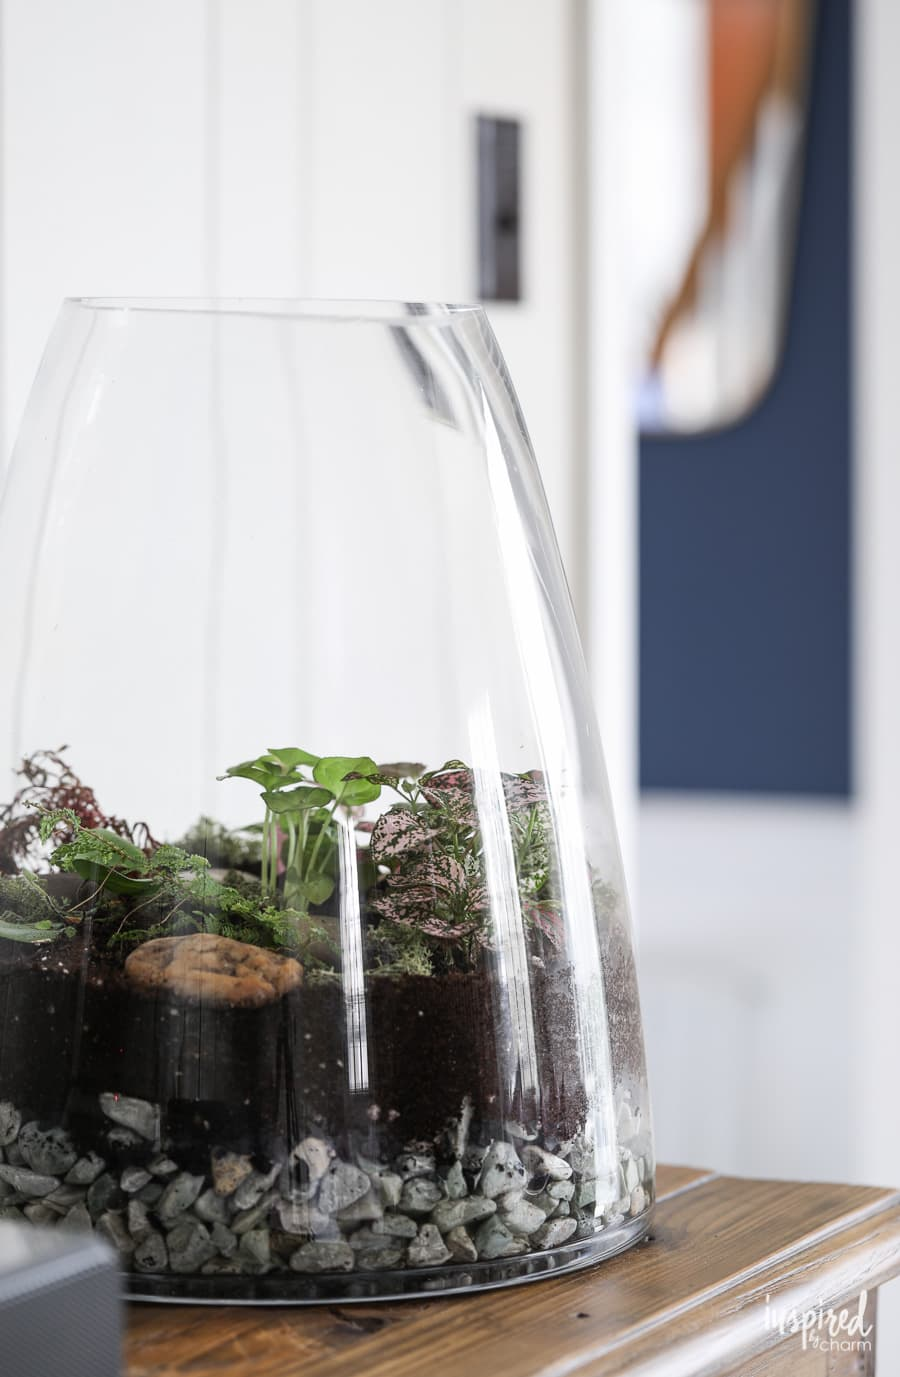 Learn how to make a terrarium! #terrarium #plants #diy #garden